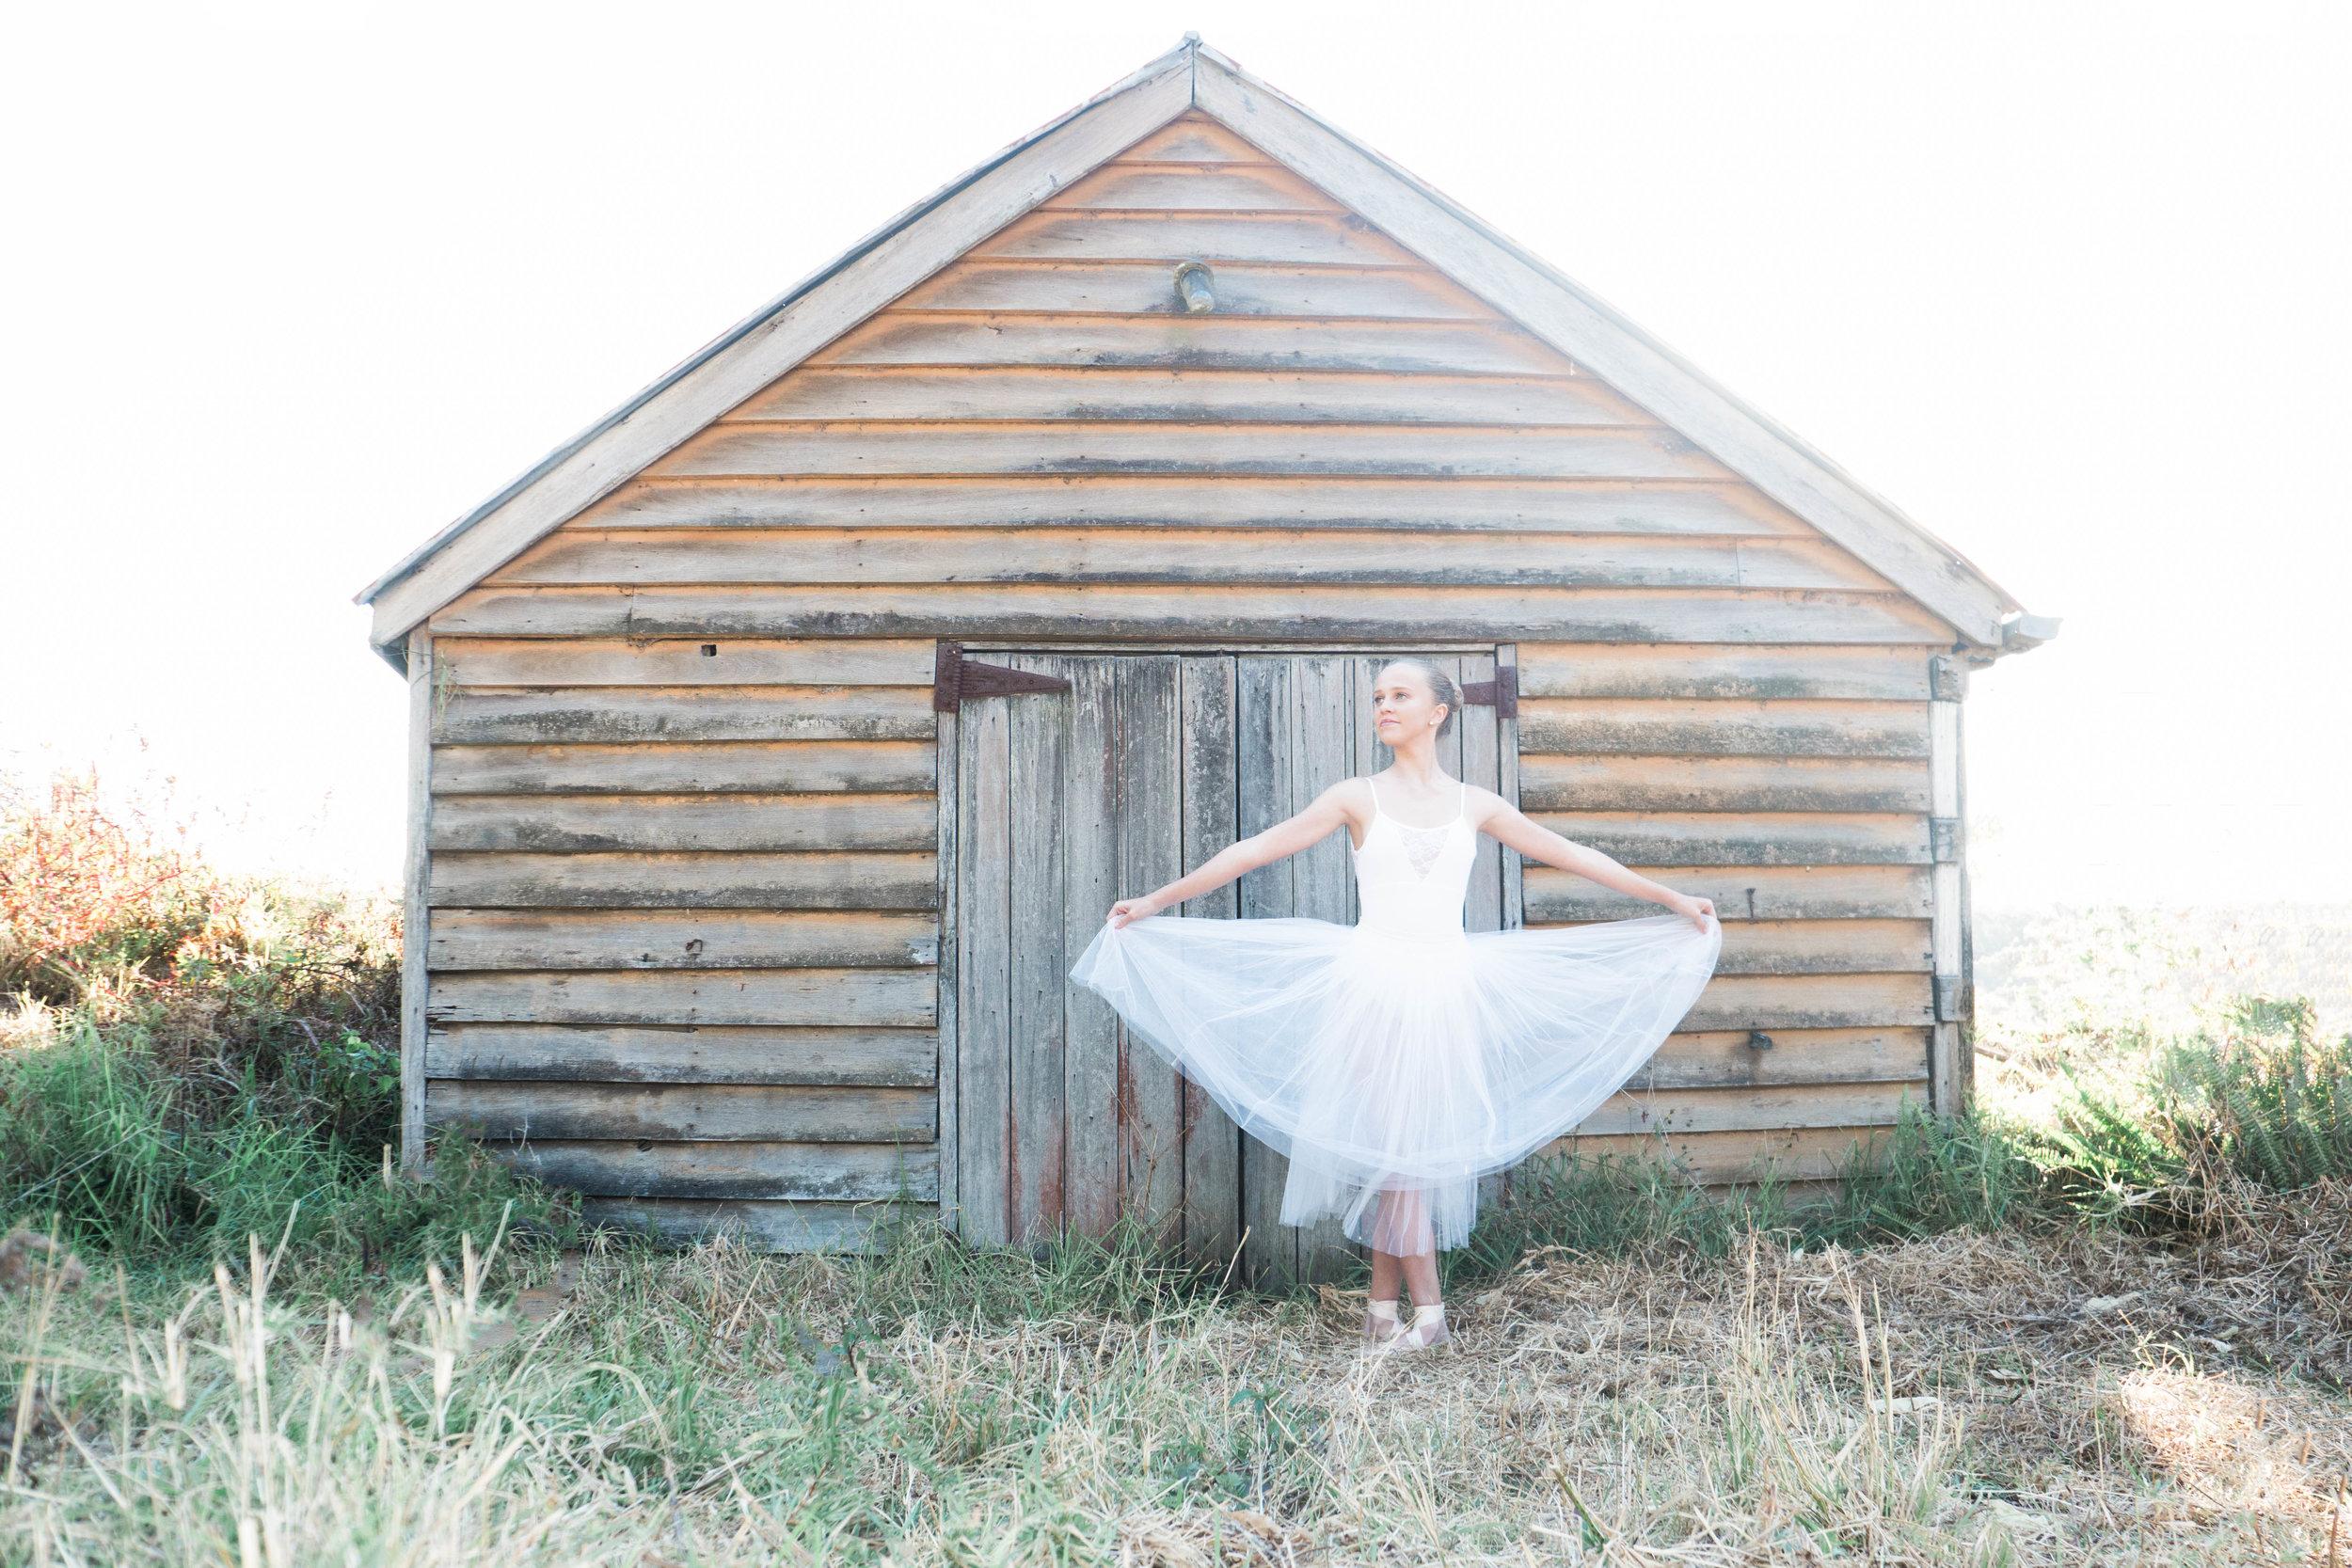 Hinterland-Dance-20.08.17-35.jpg